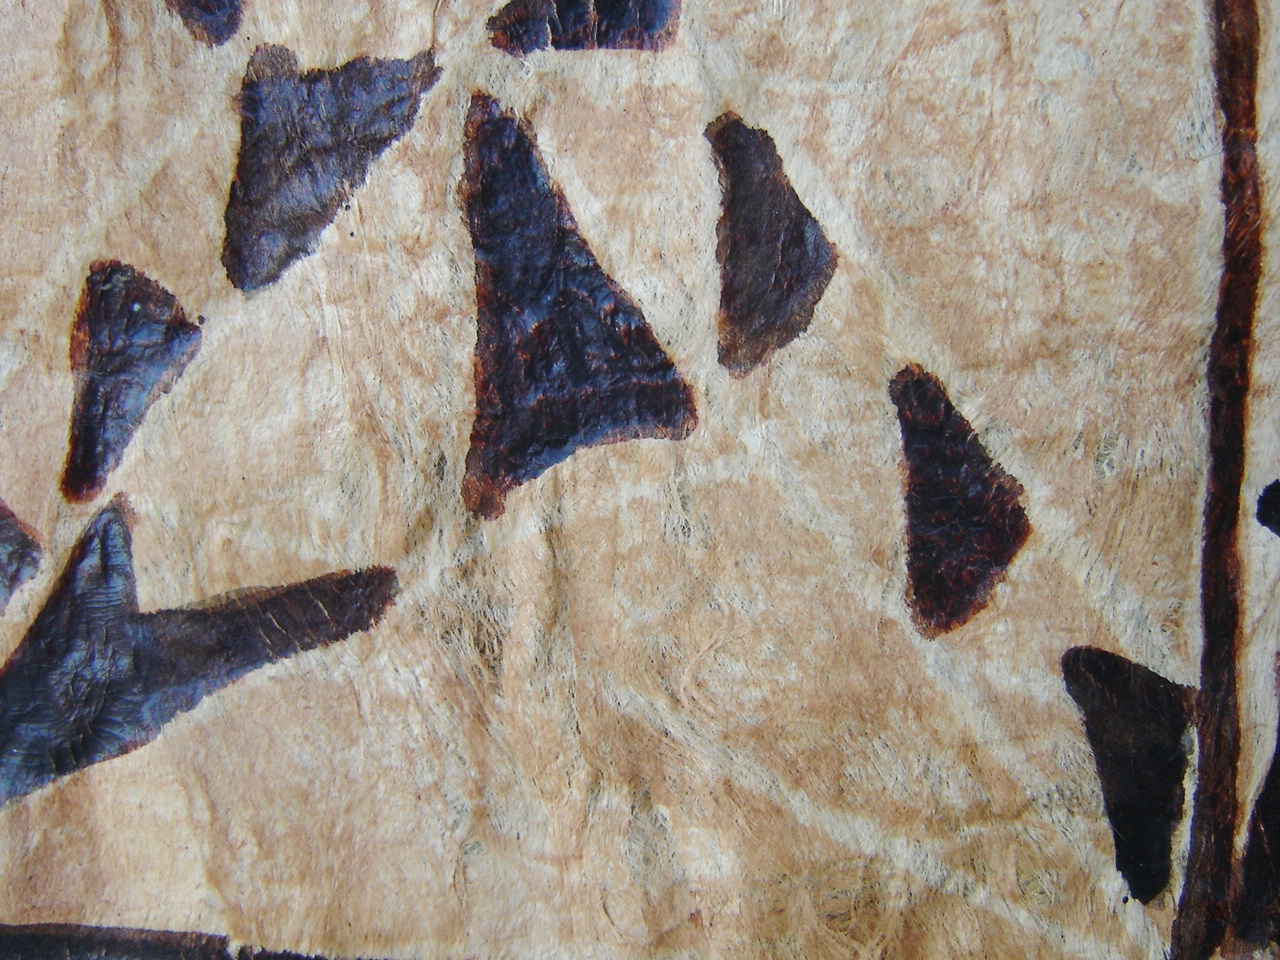 Lot 25 - Filipino Art On Pulp Rice Paper